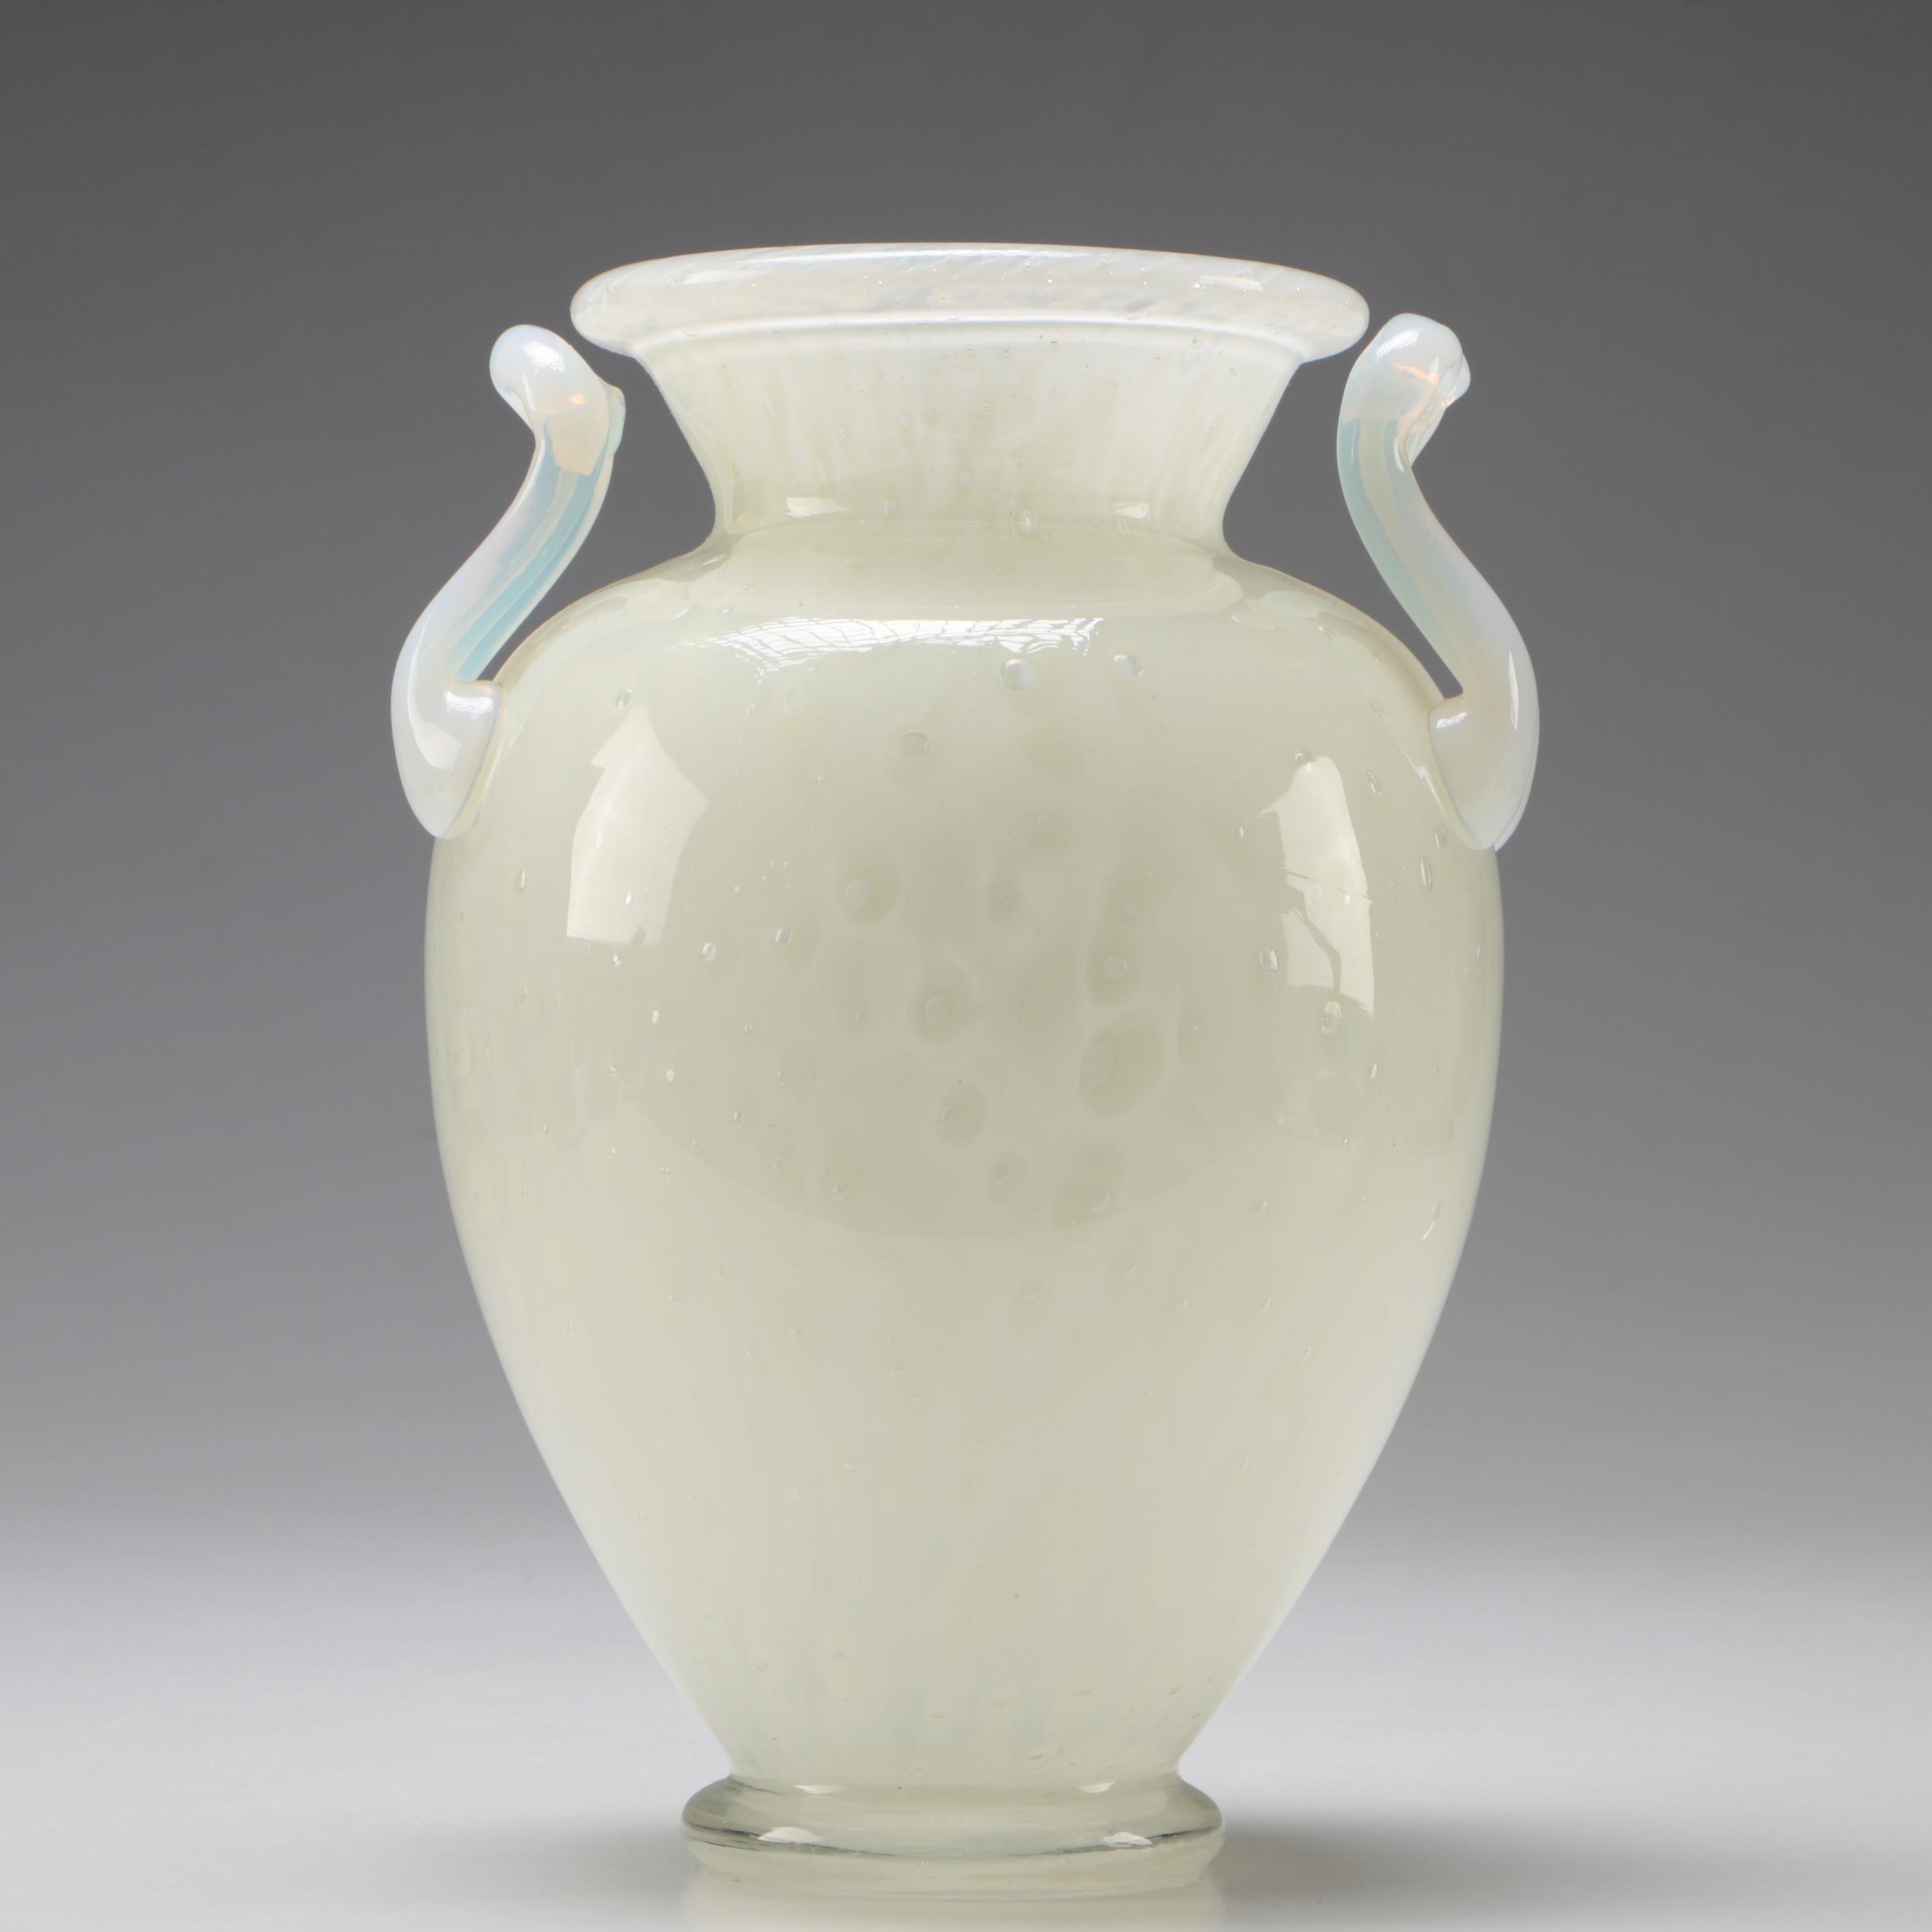 Steuben Art Glass French Opalescent White Cluthra Vase by Paul V. Gardner, 1930s